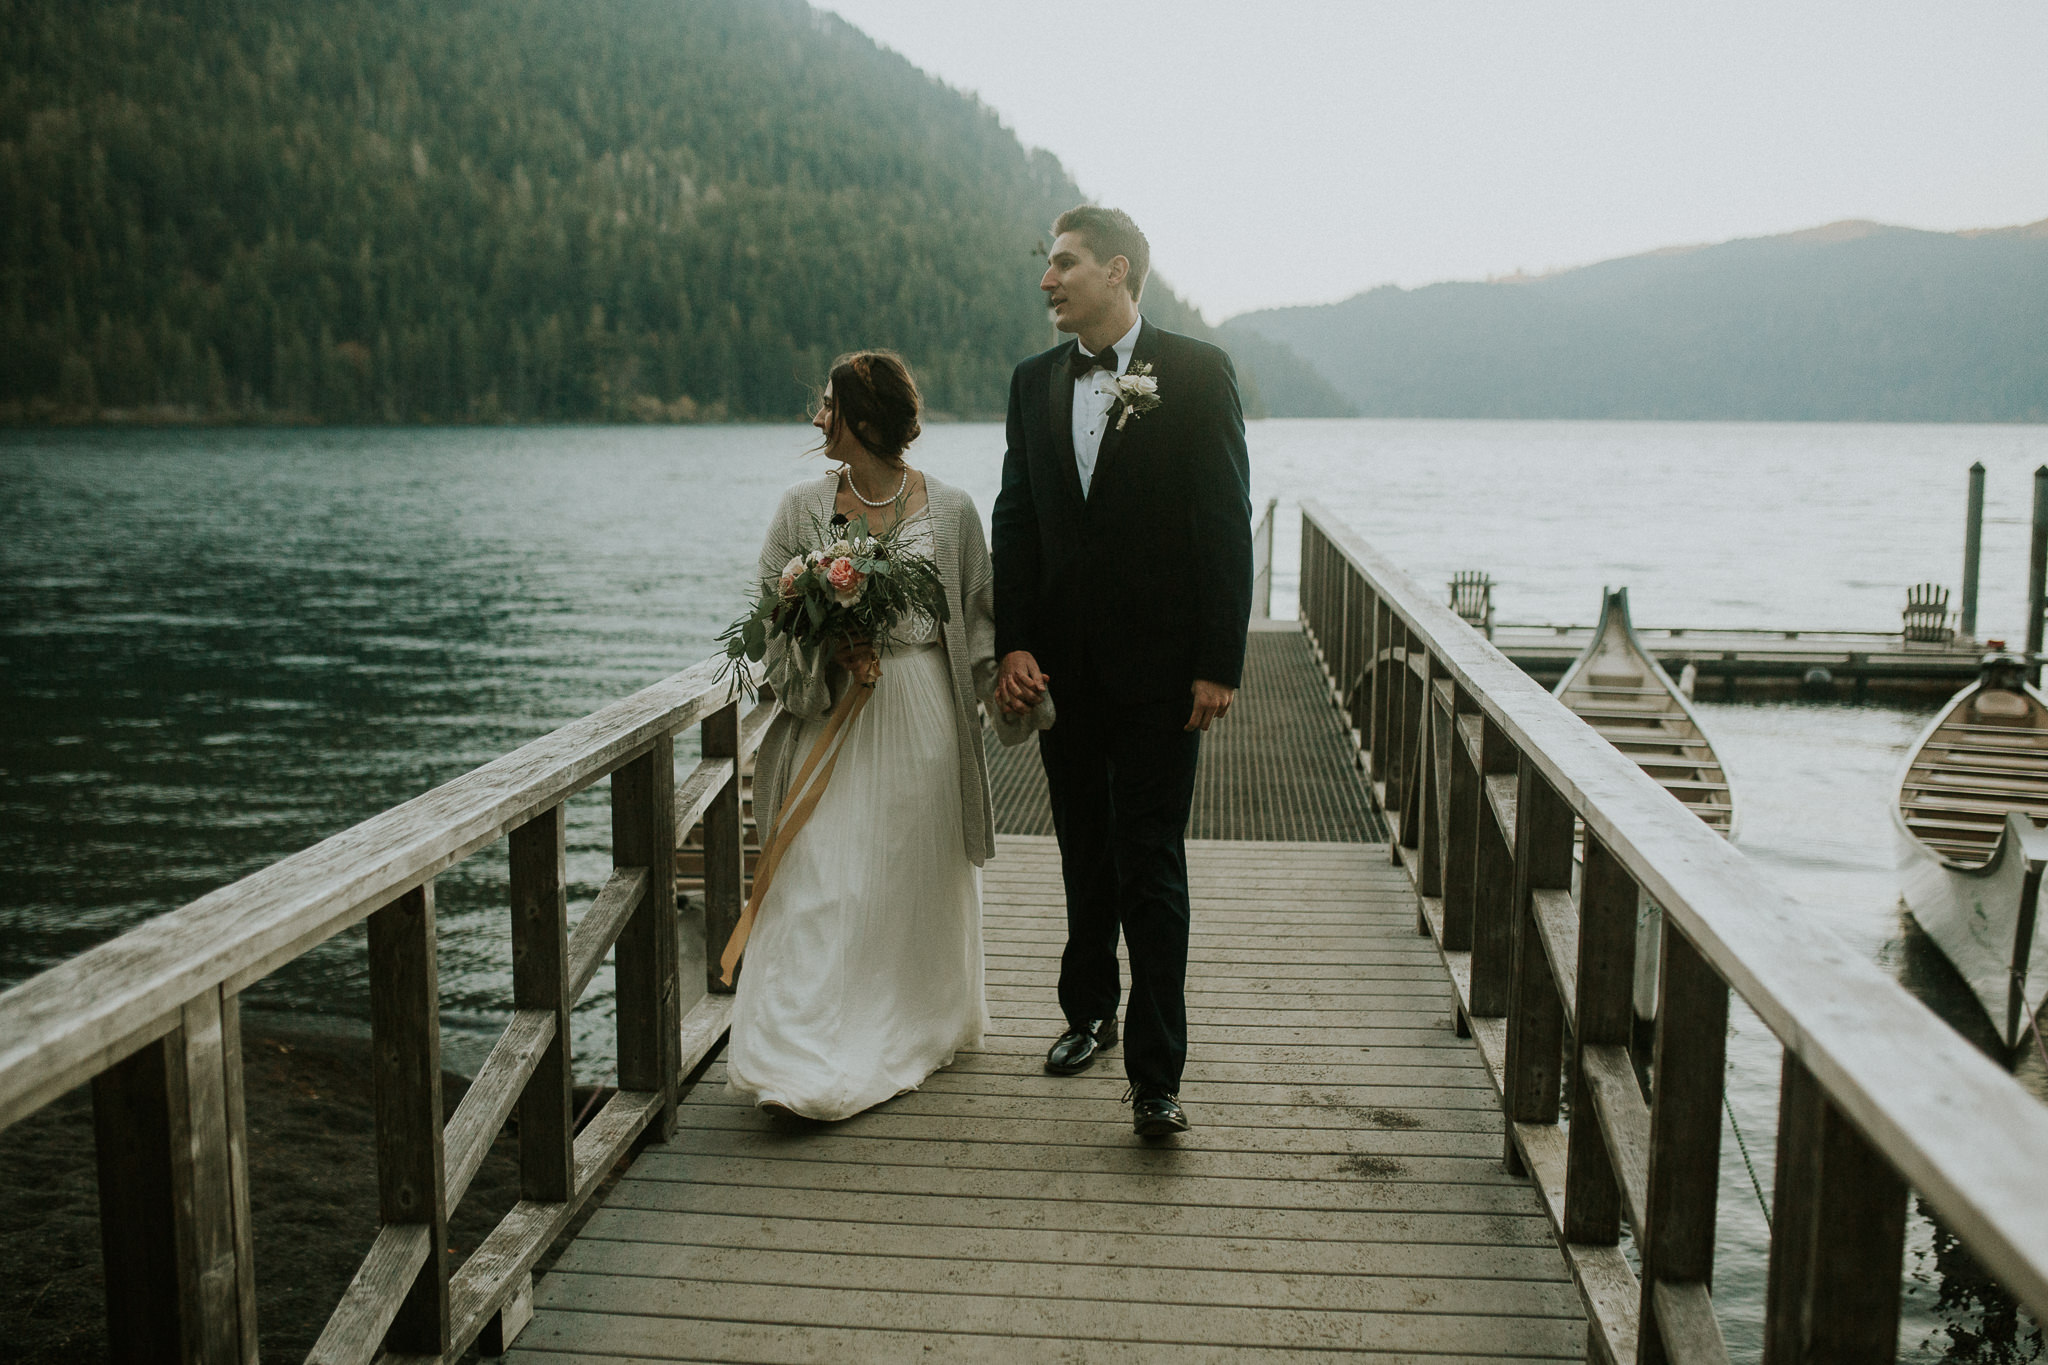 Cresent-lake-elopement-BreeAnna-Lasher-65.jpg